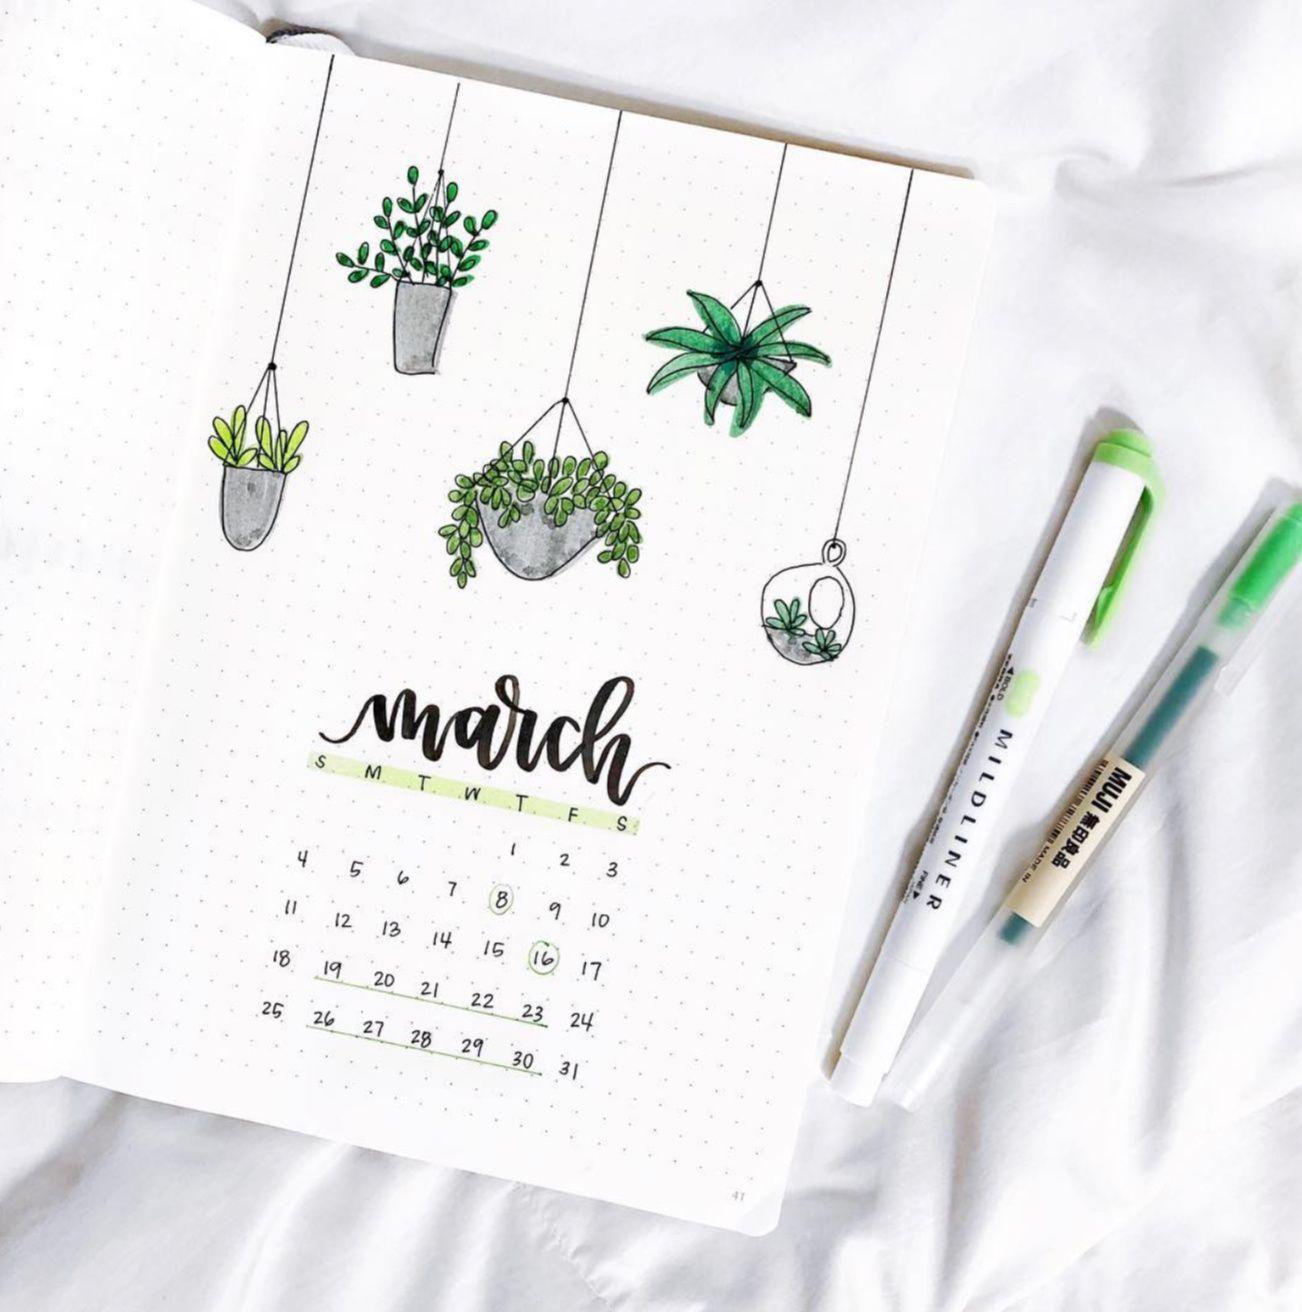 12 Gorgeous Bullet Journal Calendar Ideas - Live Better Lifestyle